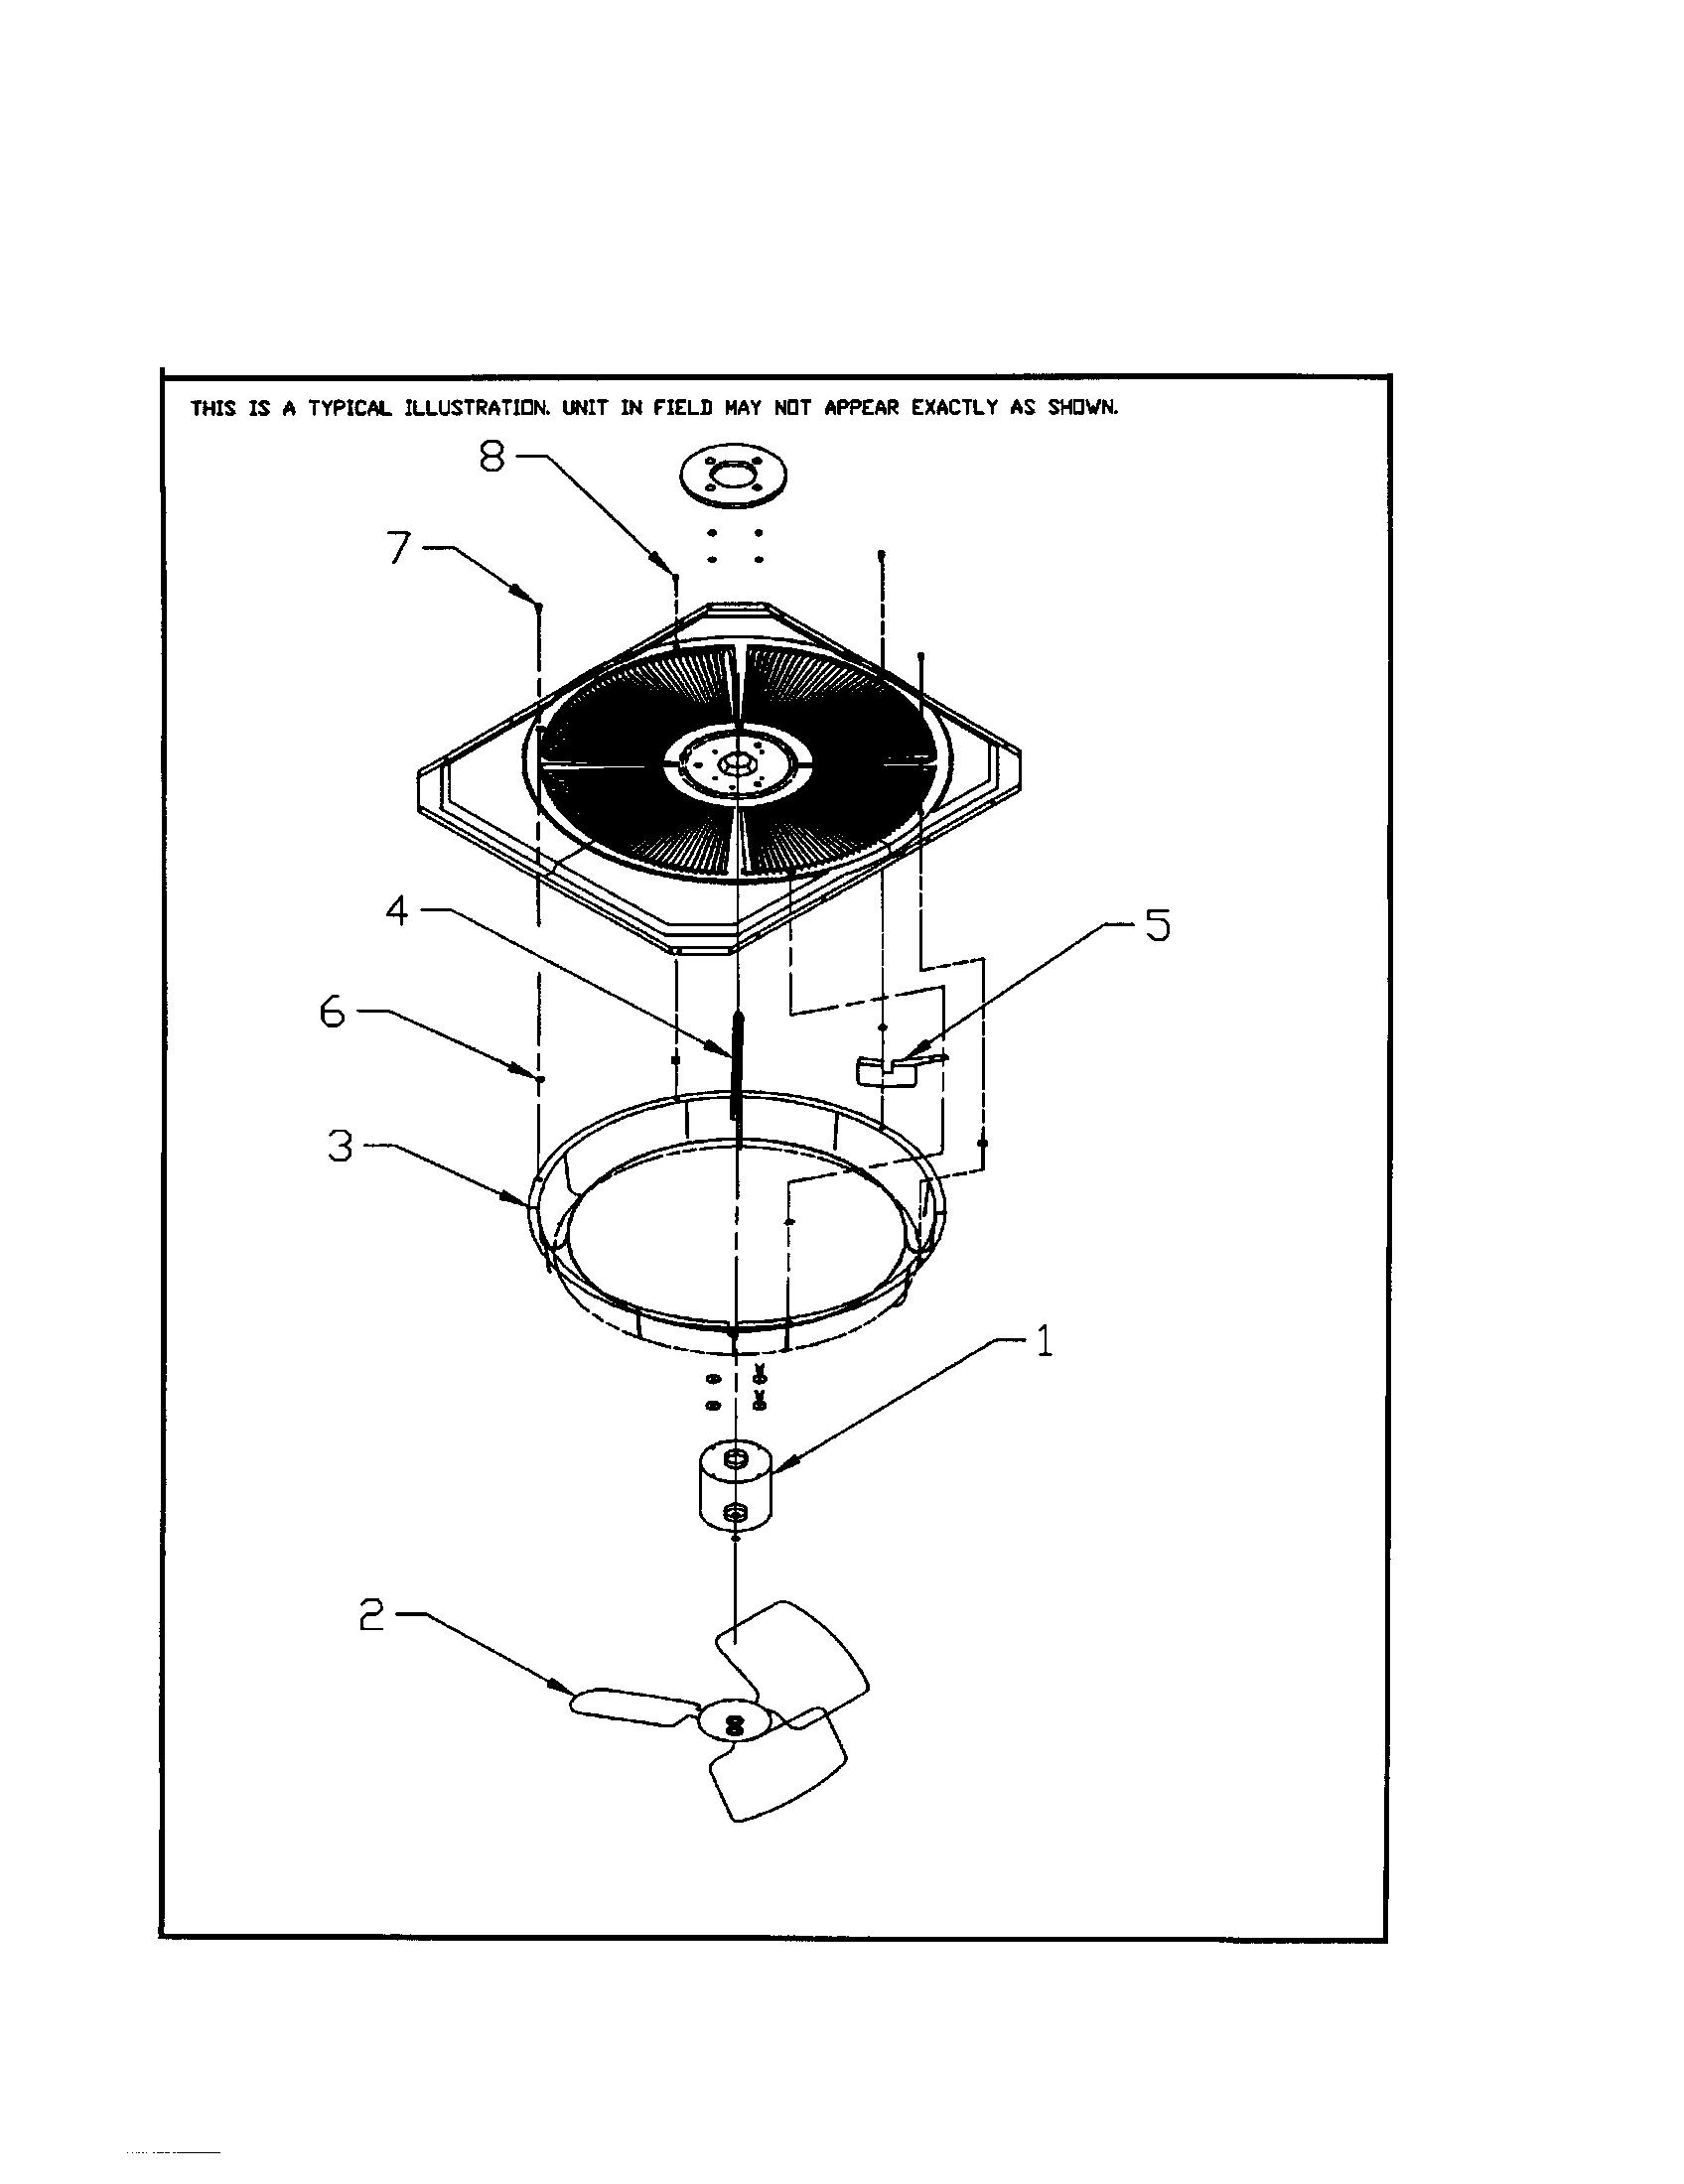 hight resolution of photos of trane heat pump parts